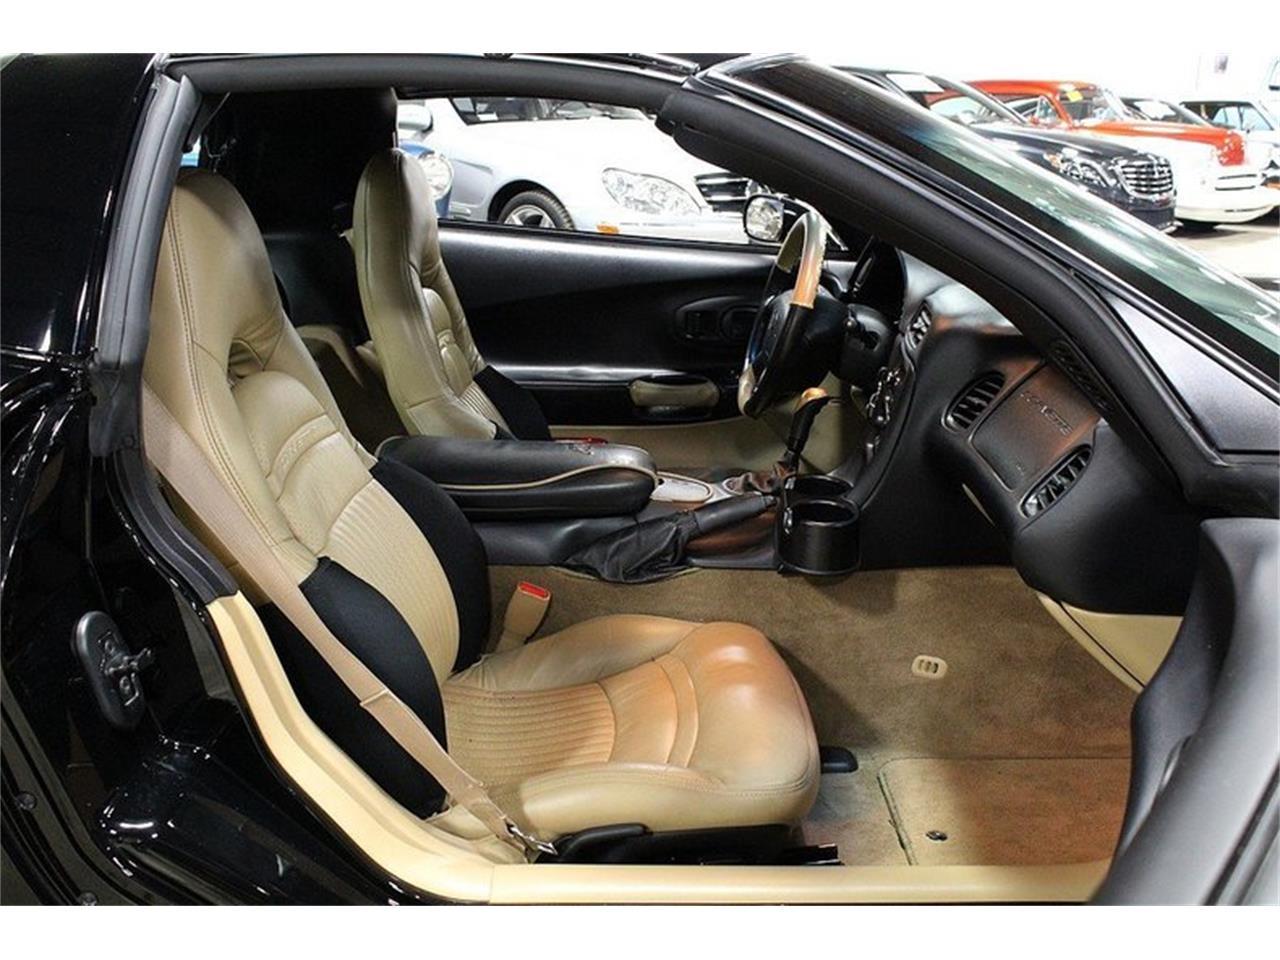 Large Picture of 1998 Corvette located in Michigan - $14,900.00 - L5NJ